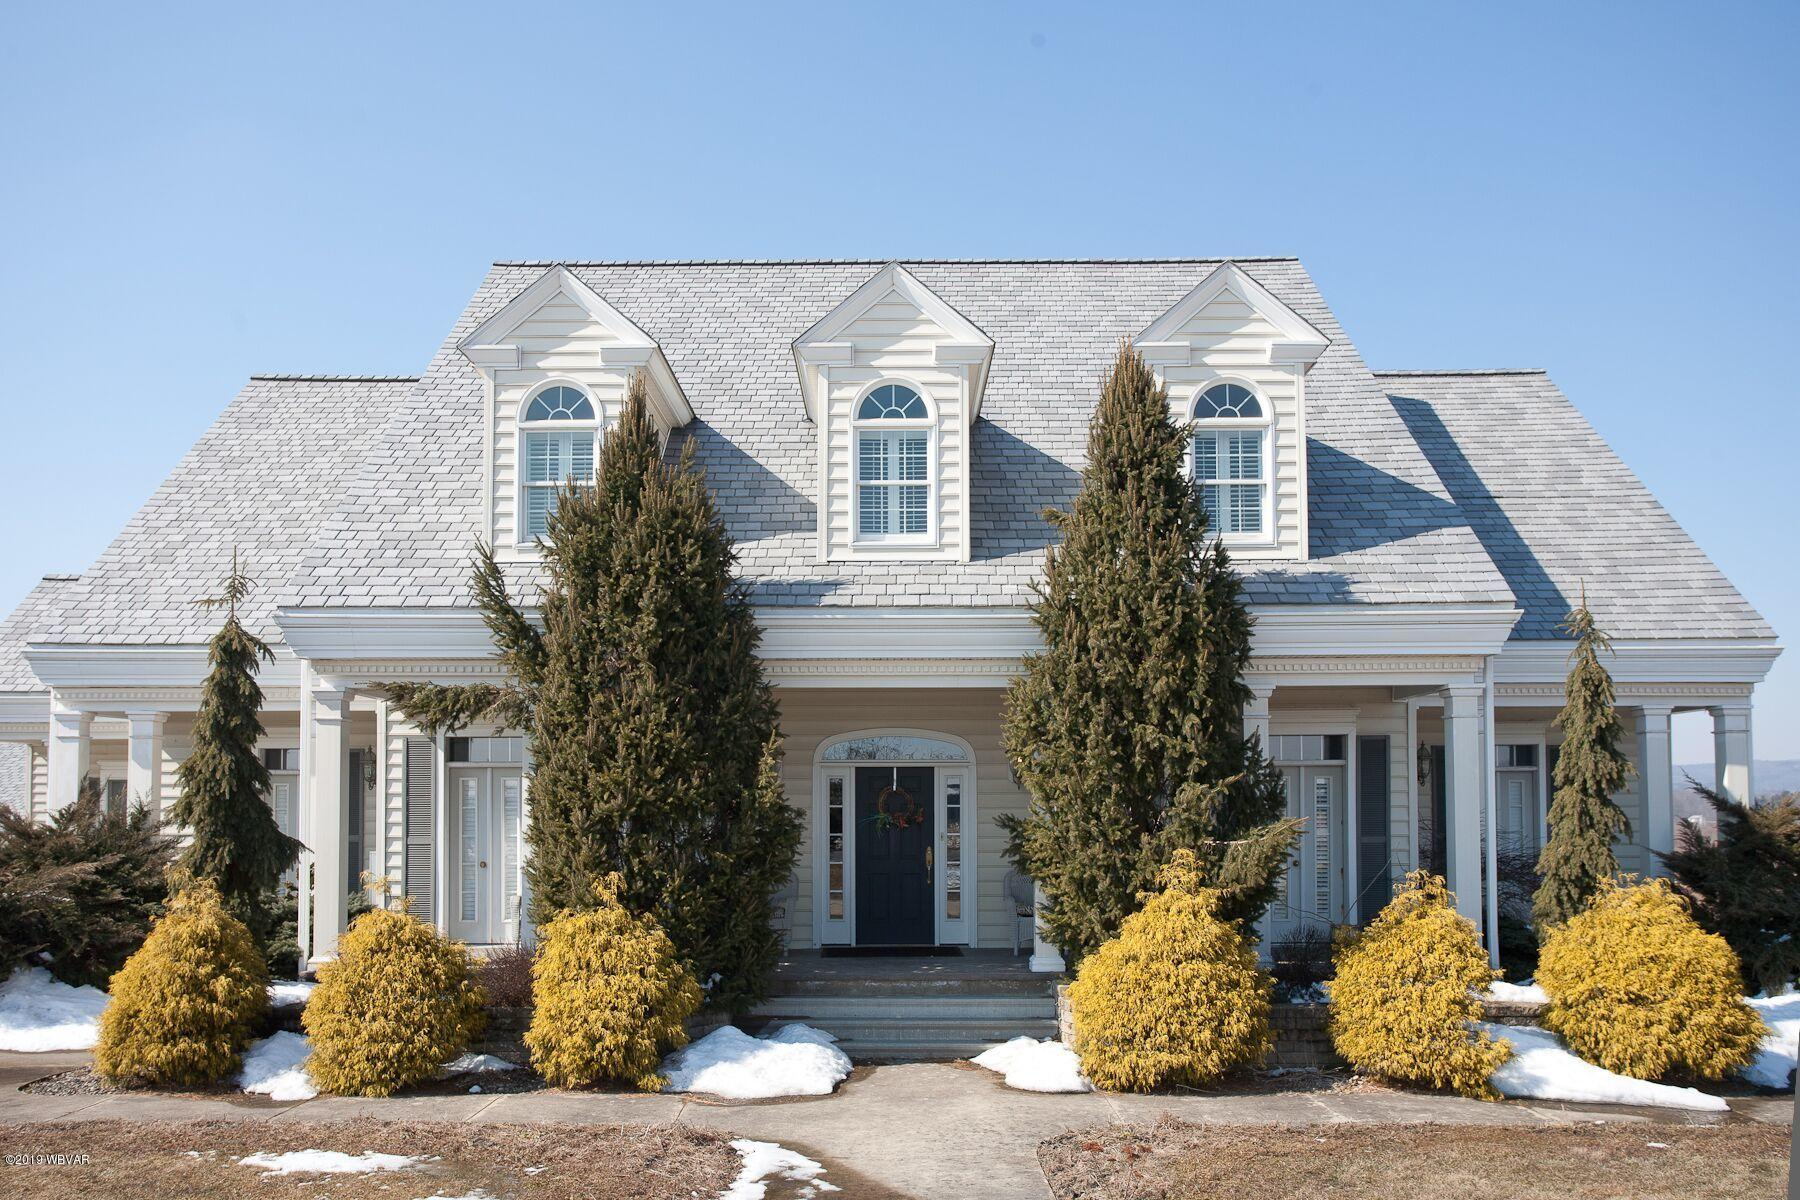 909 WARRIOR RUN BOULEVARD,Turbotville,PA 17772,6 Bedrooms Bedrooms,7 BathroomsBathrooms,Residential,WARRIOR RUN,WB-86602